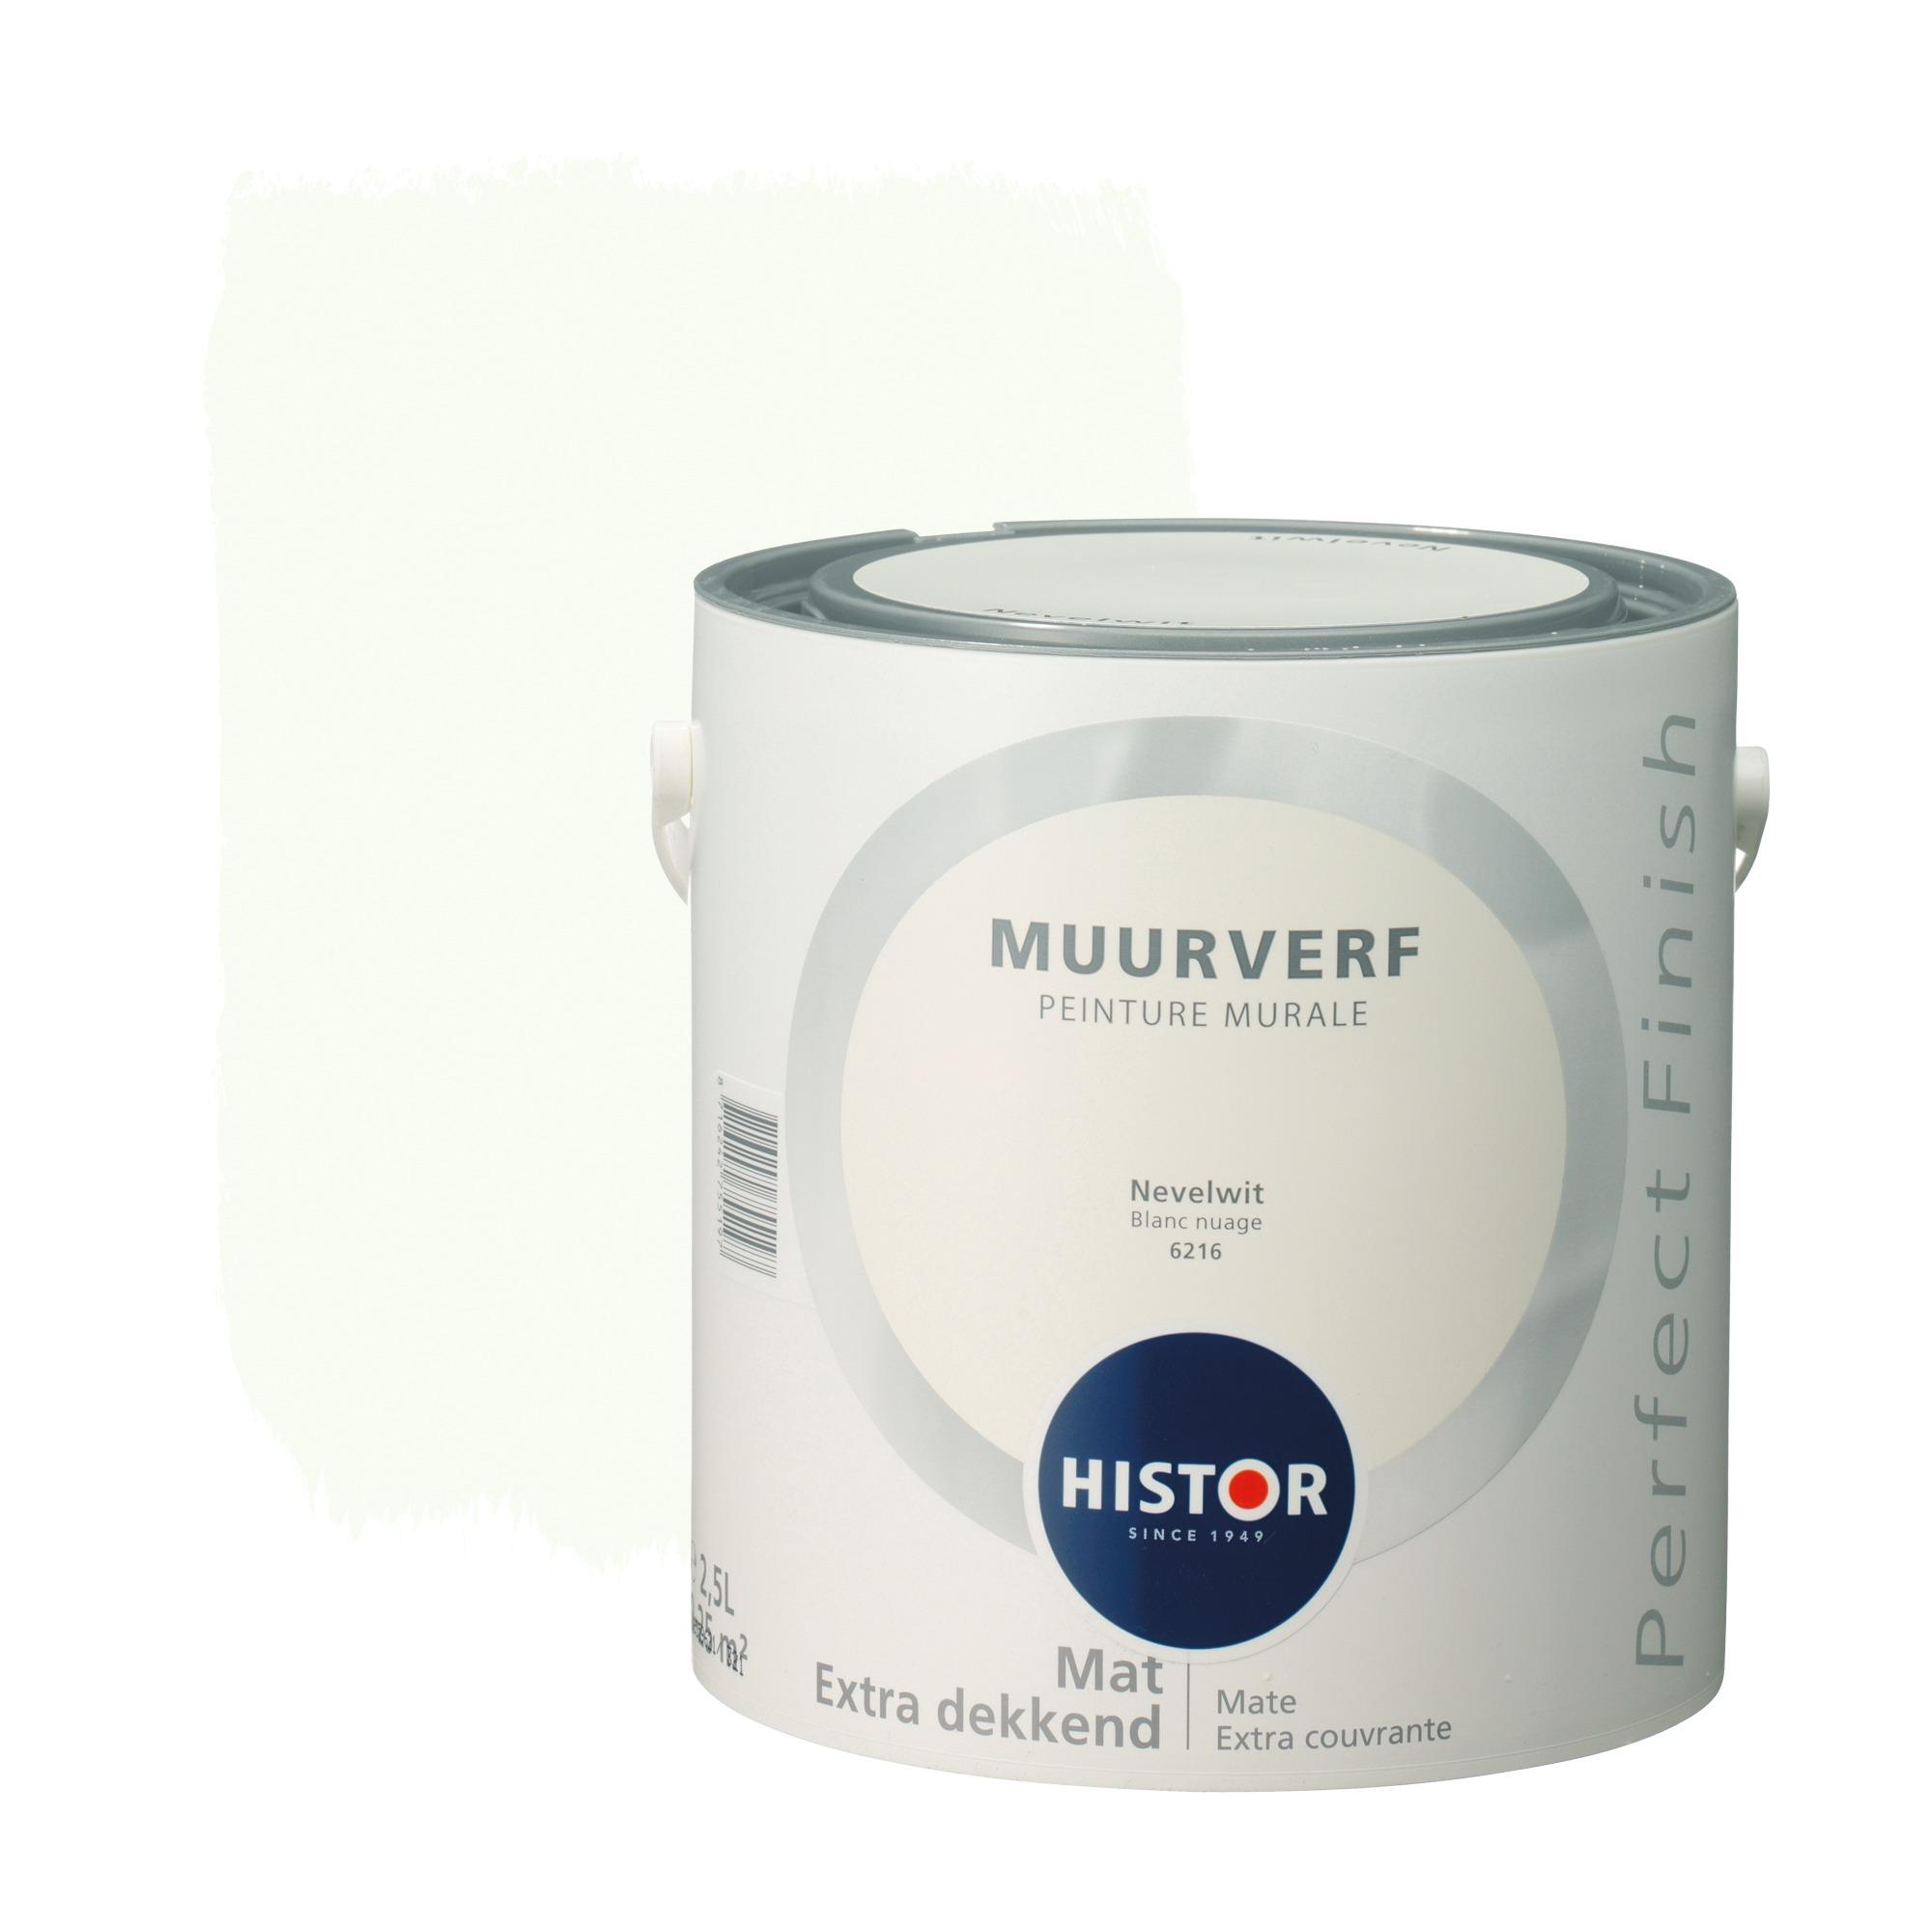 Histor perfect finish muurverf mat nevelwit 6216 2,5 l